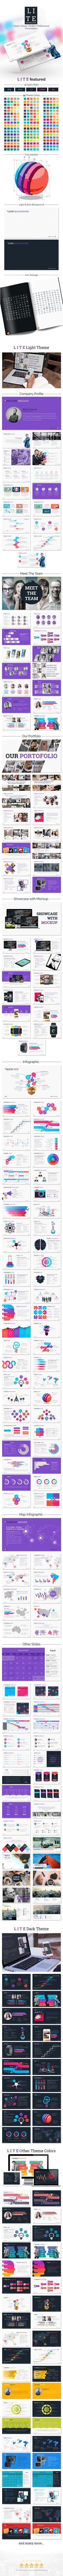 LITE Presentation - Powerpoint Template (PowerPoint Templates)